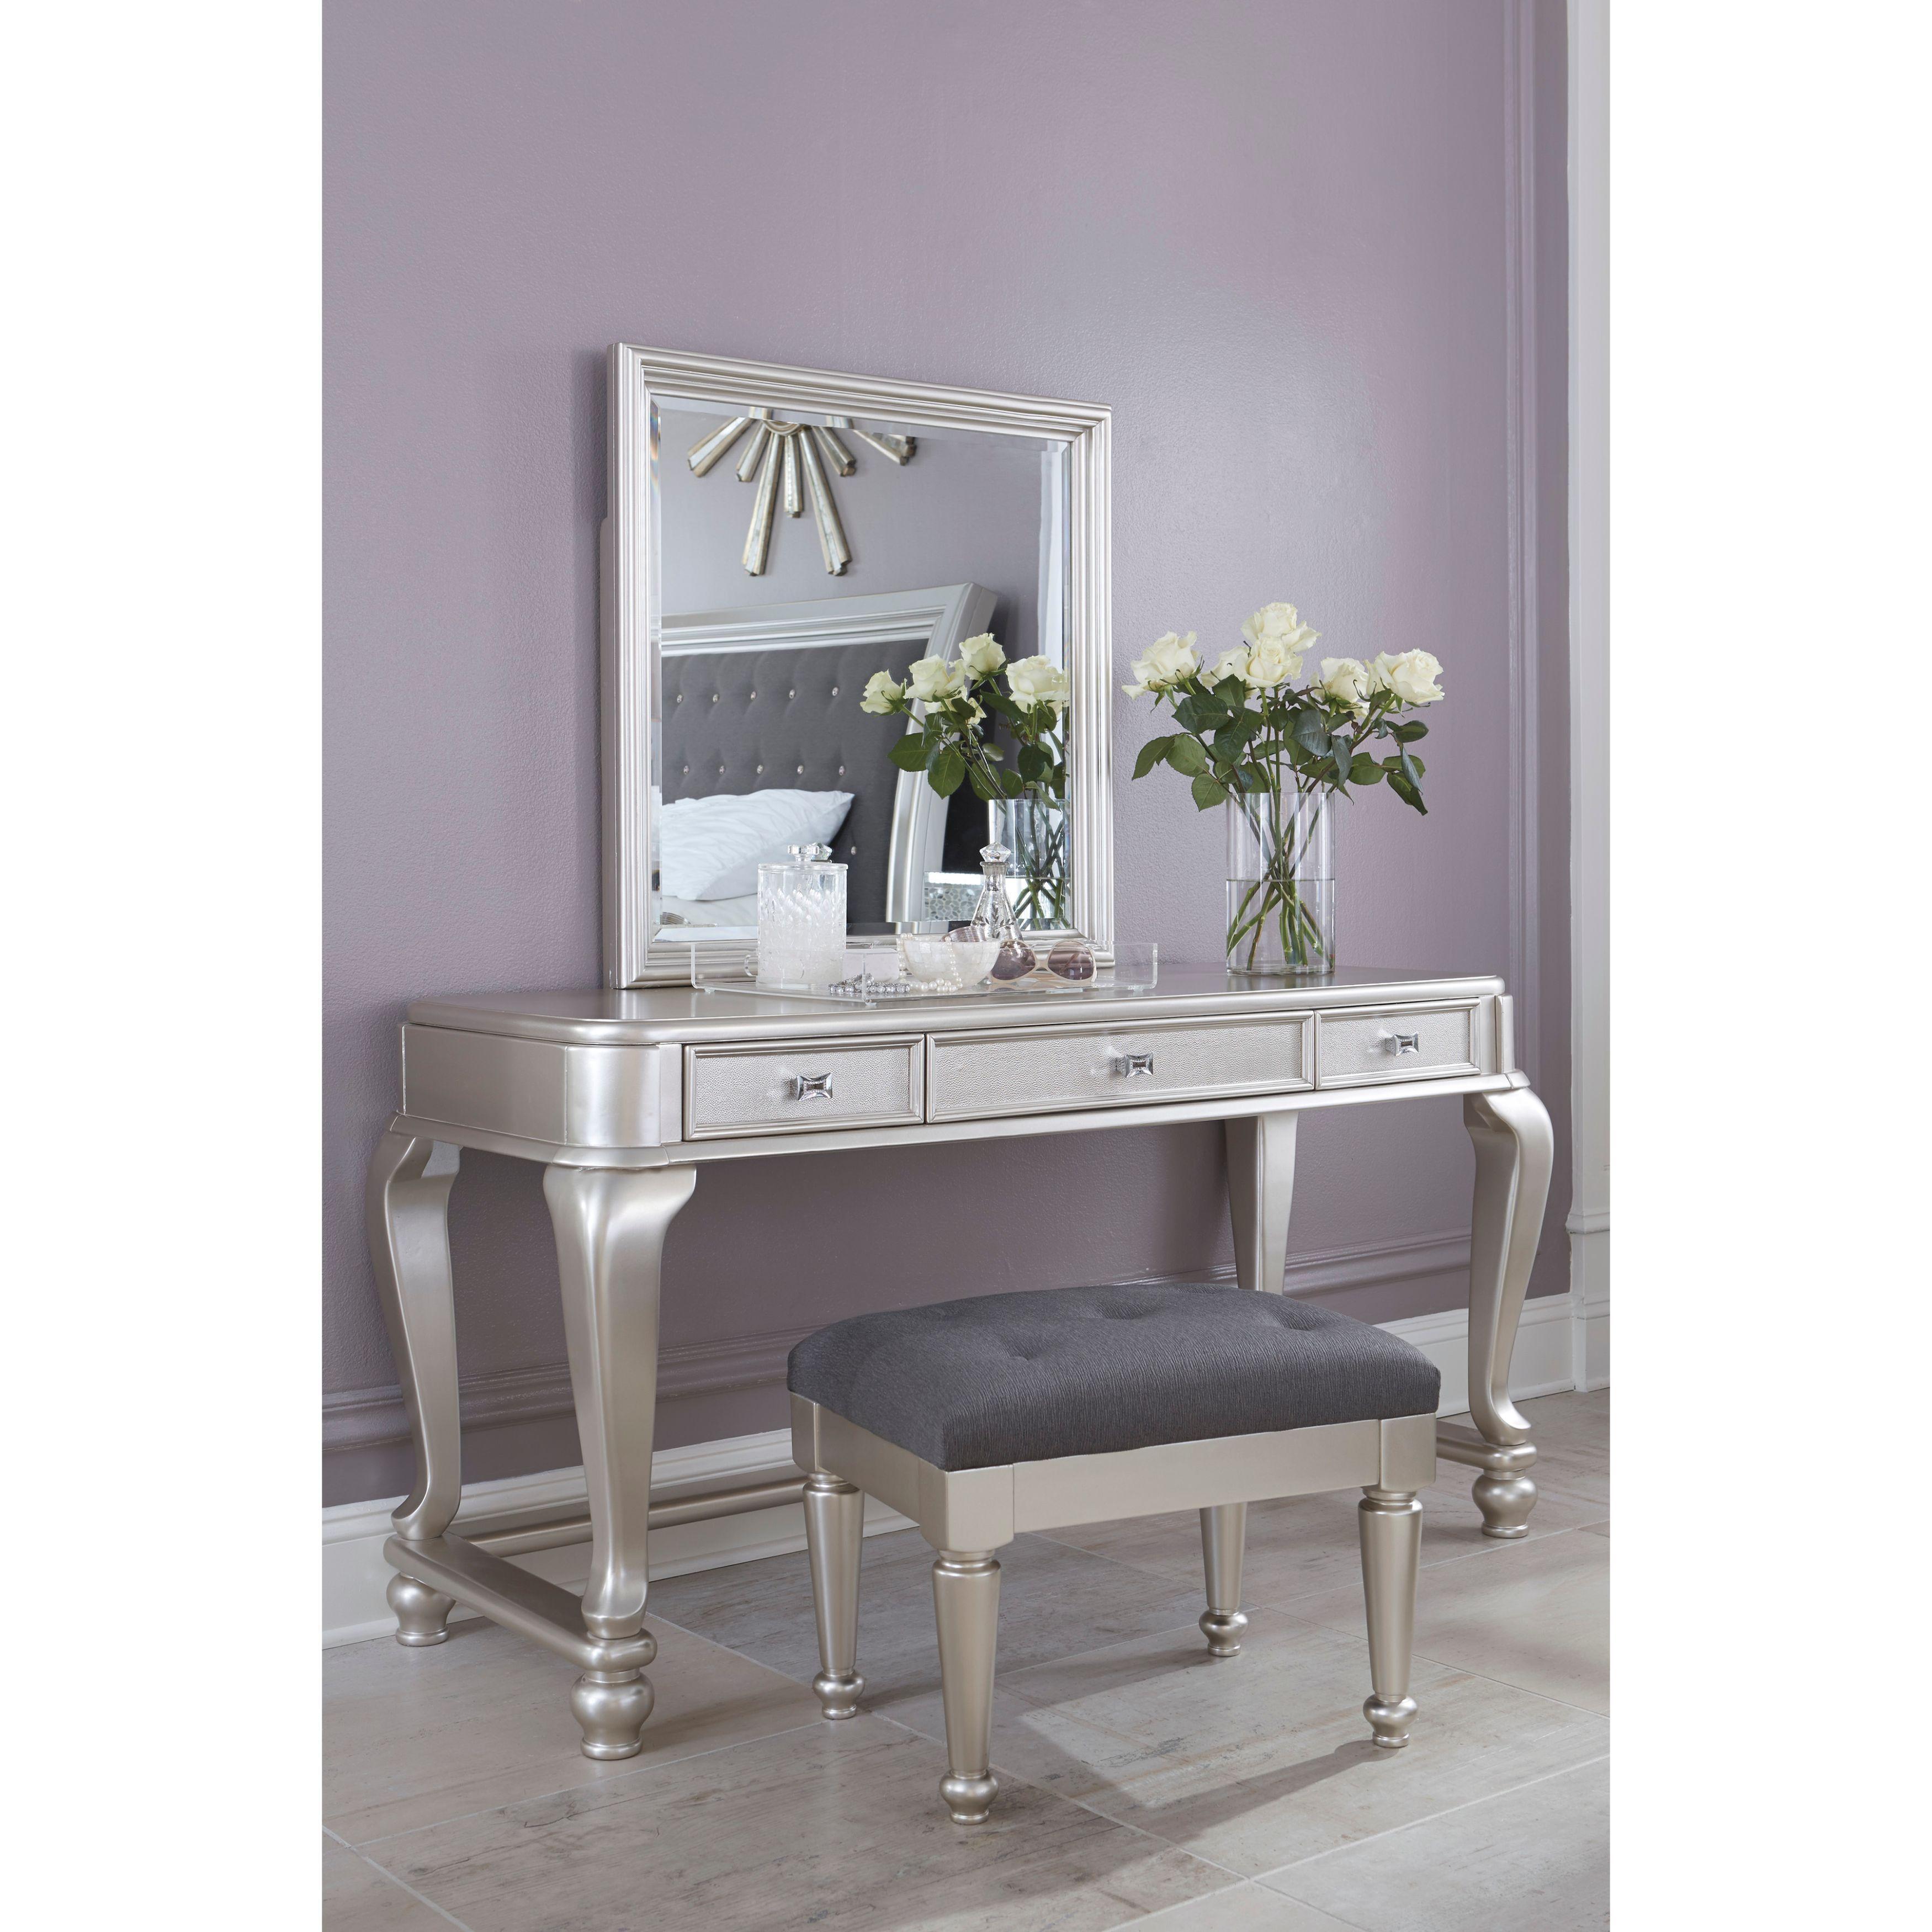 Ashley Coralayne Silver Upholstered Stool (Vanity set)